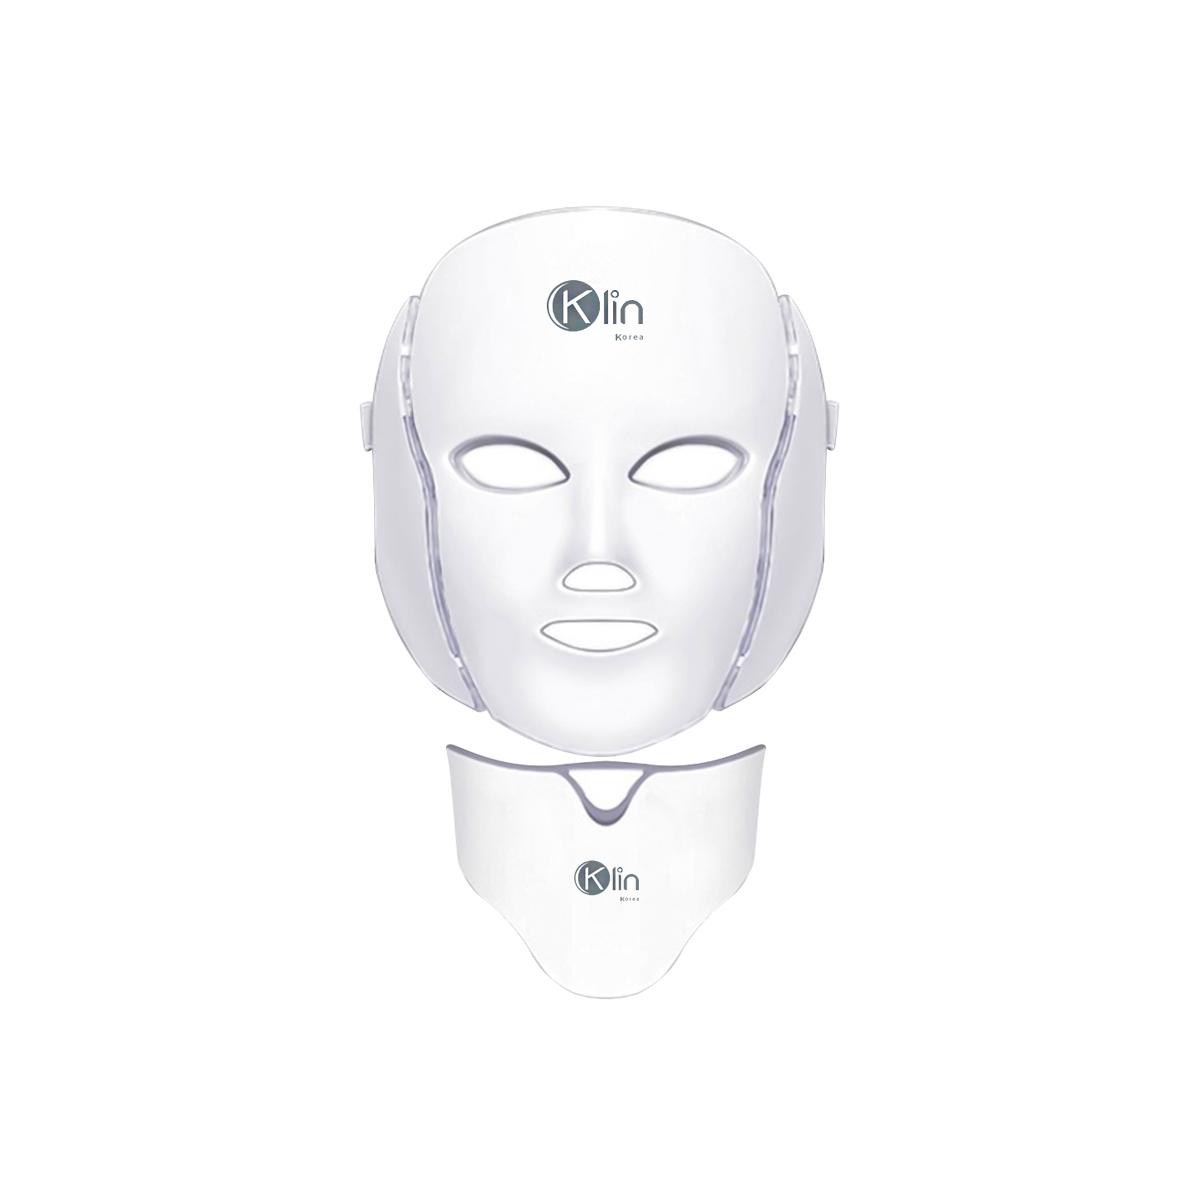 دستگاه جوان سازی پوست کلین مدل LED MASK